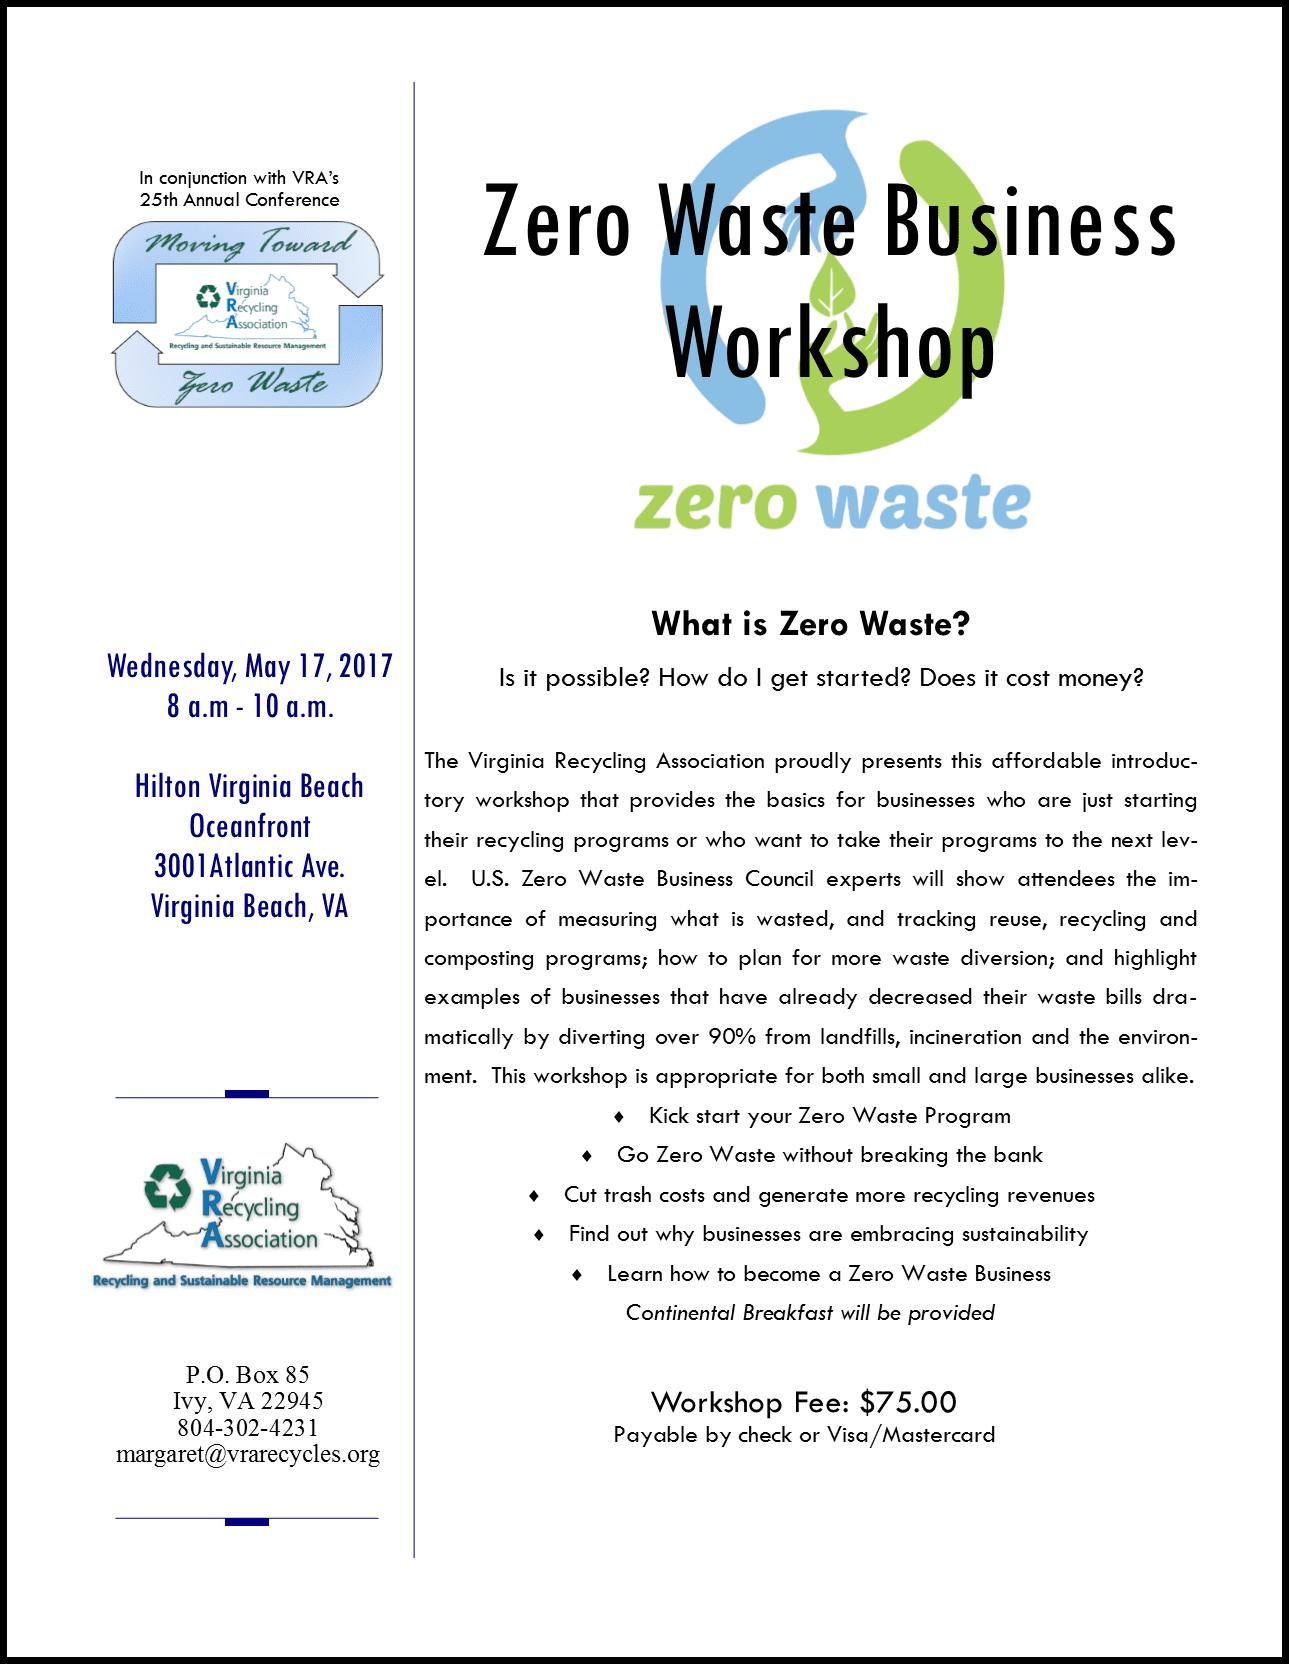 ZW-Business-Workshop-Flyer